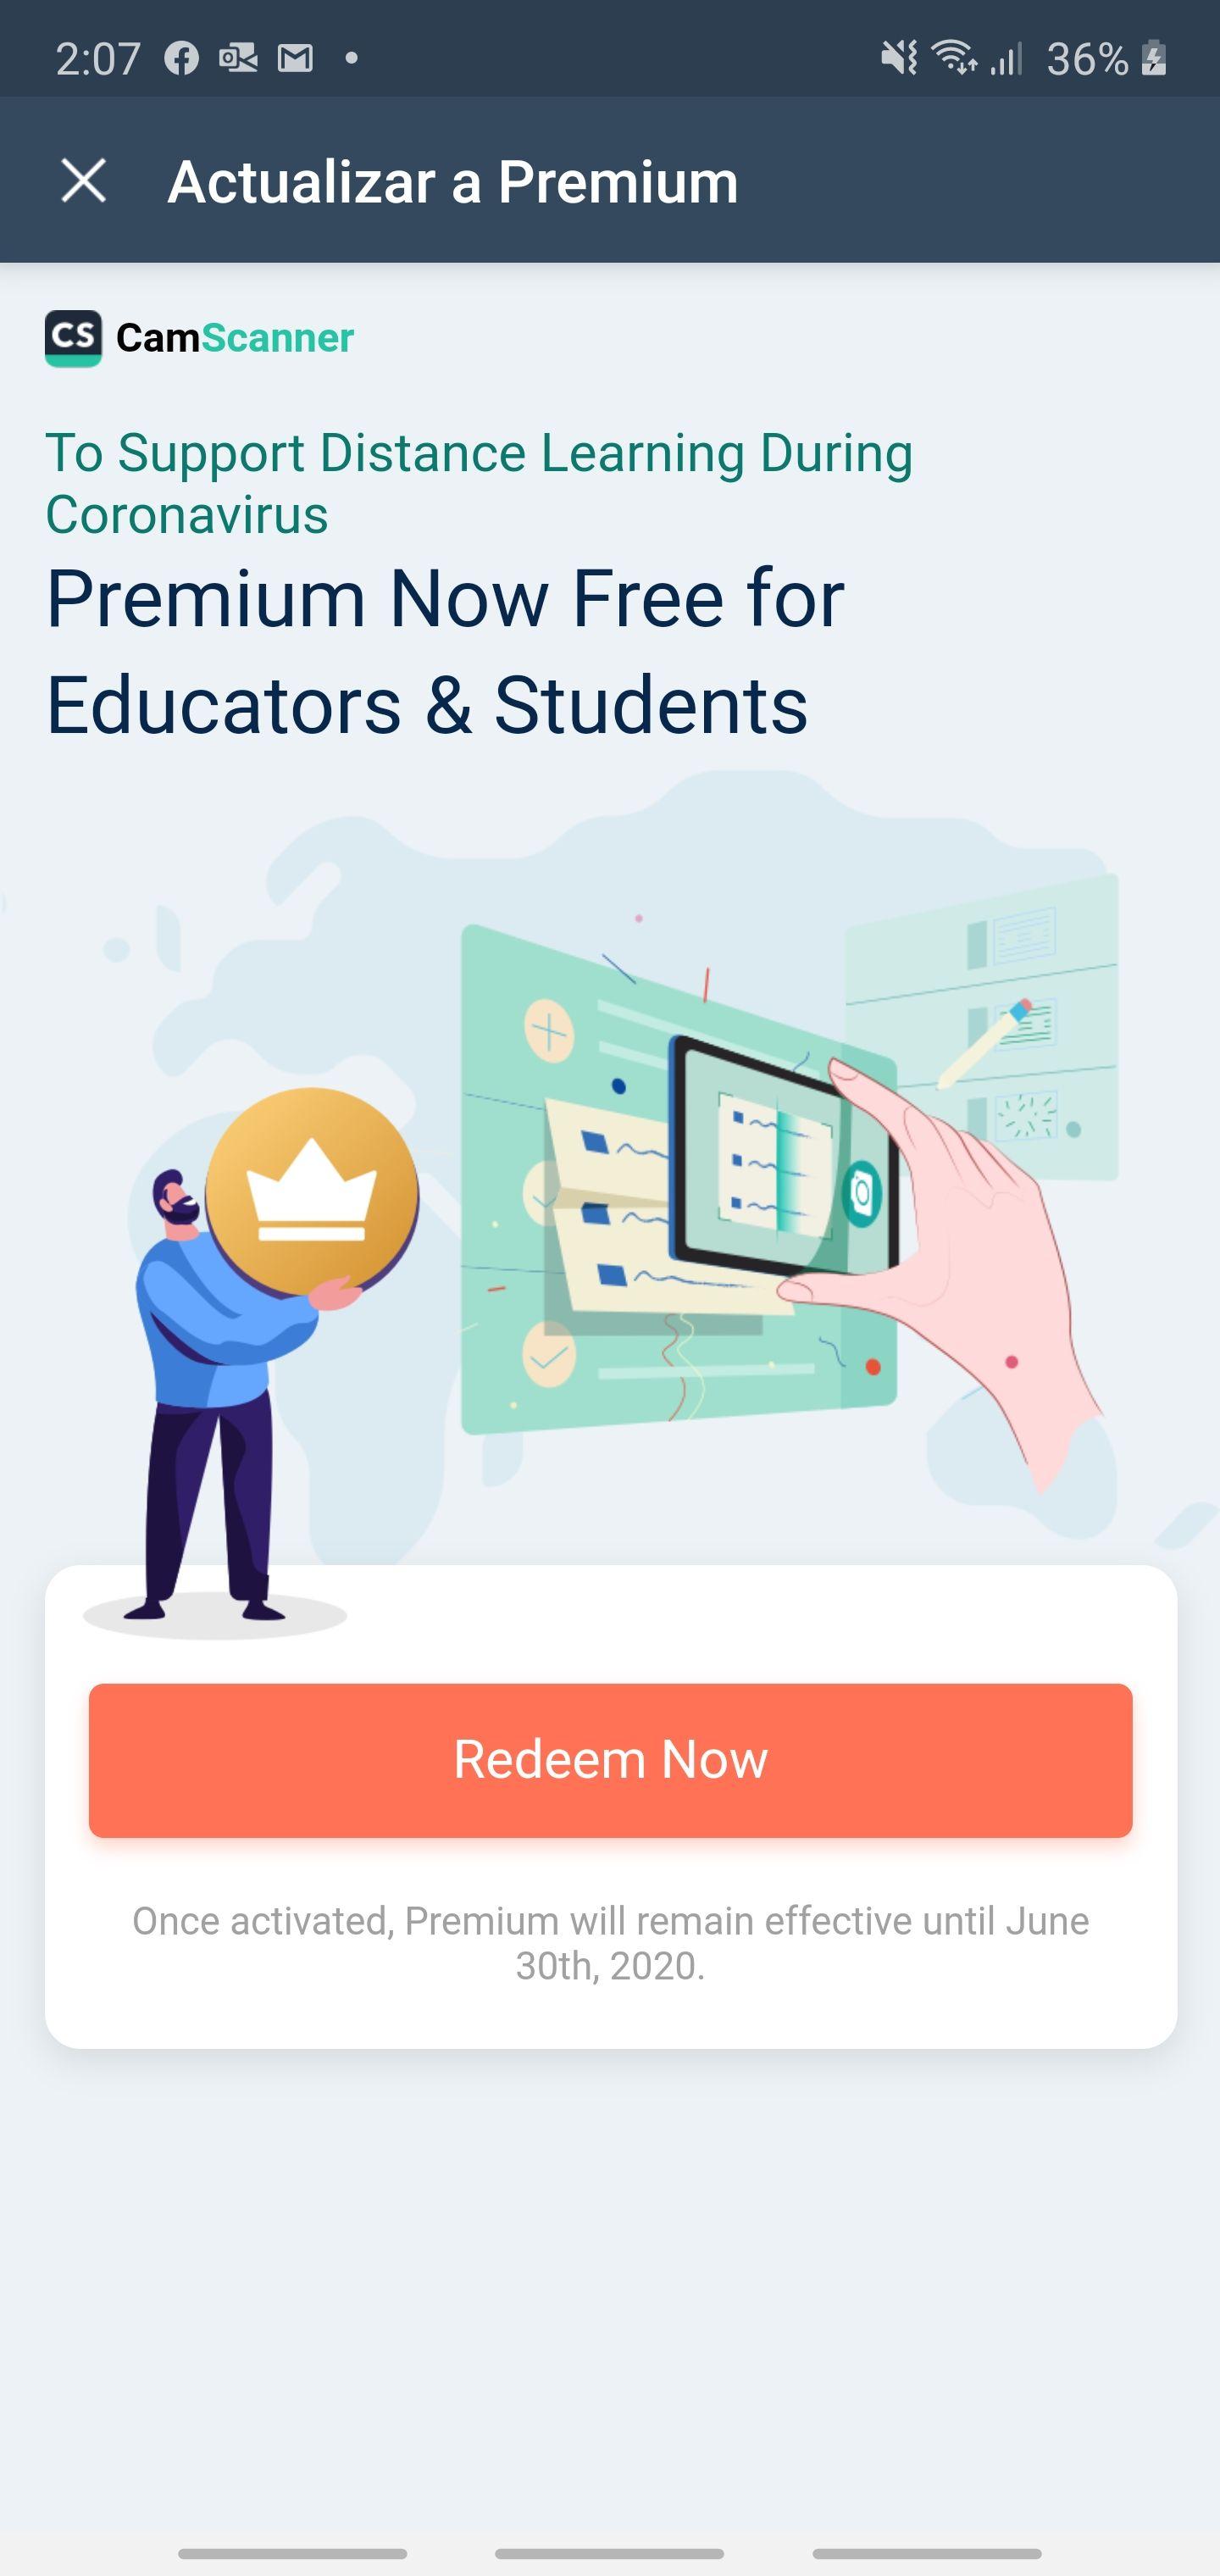 CamScanner: Premium gratis para maestros y estudiantes